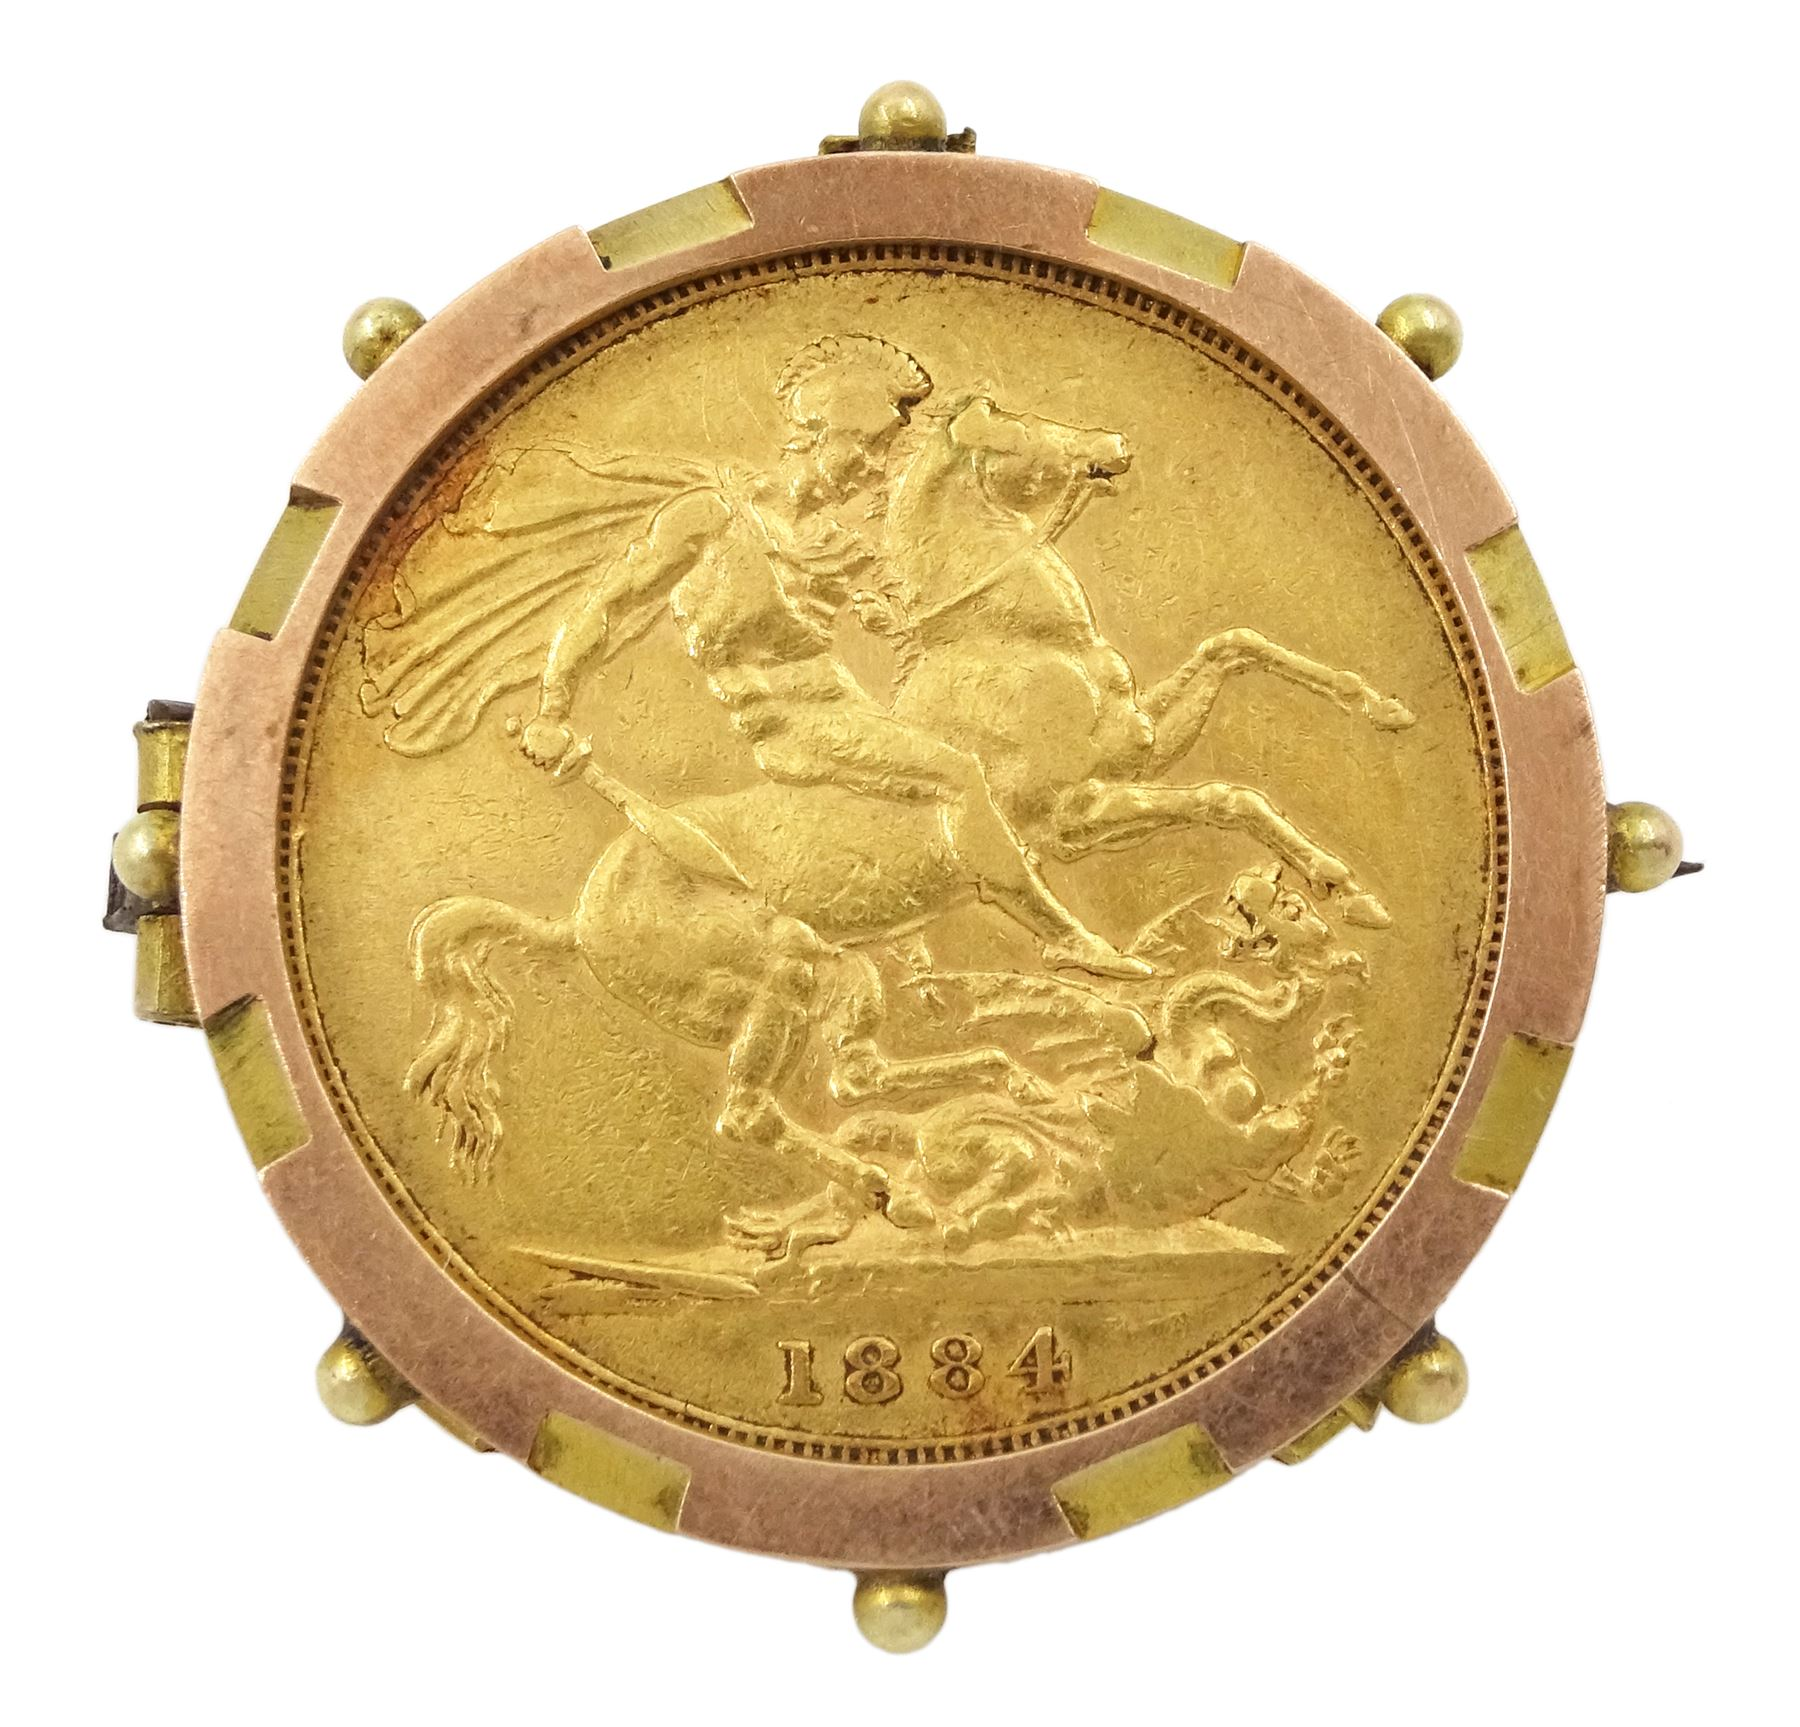 Queen Victoria 1884 gold full sovereign coin